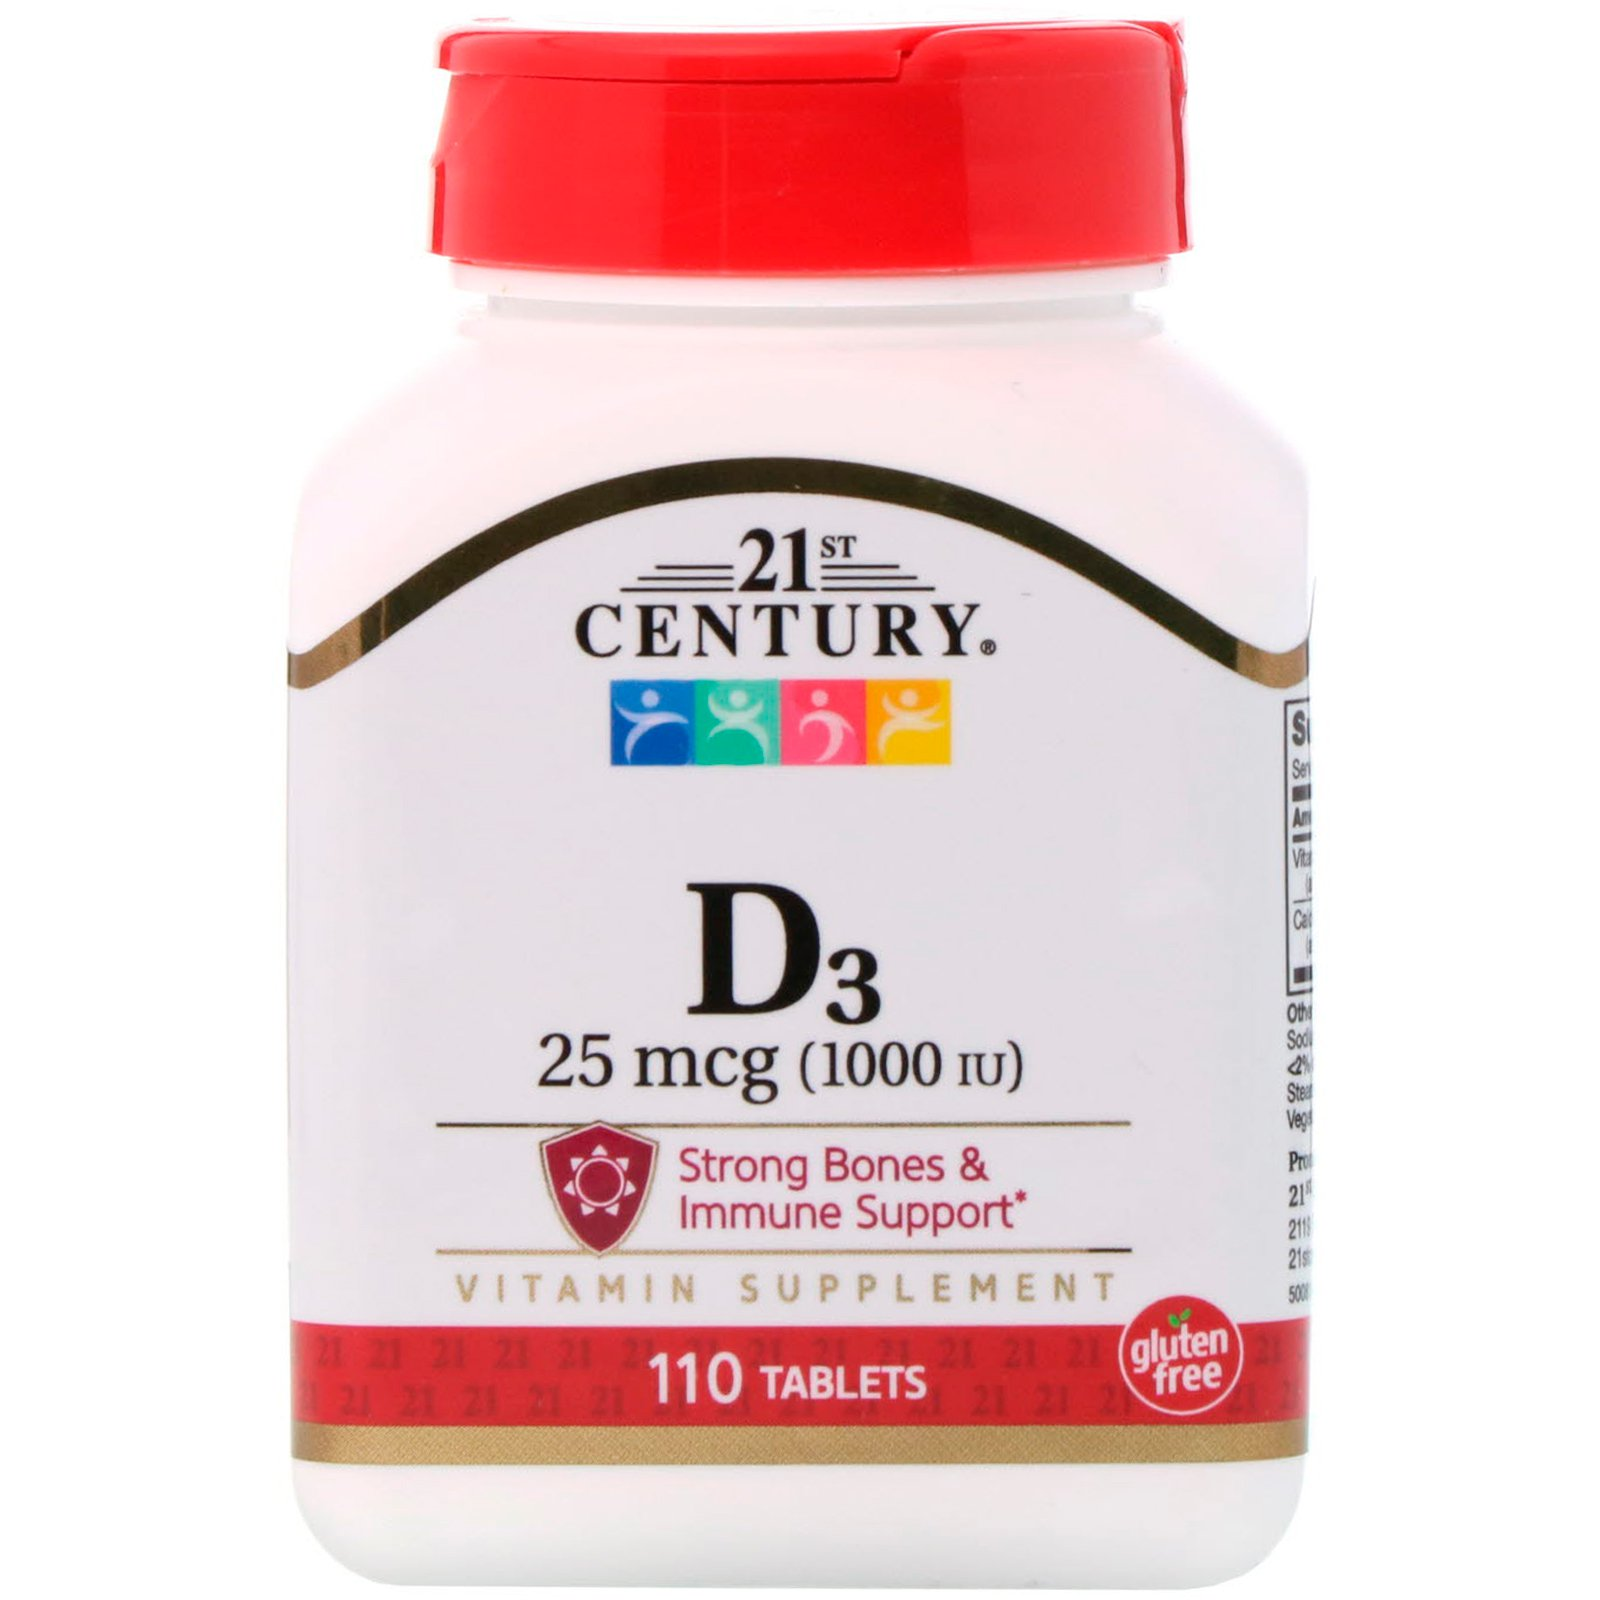 21st Century D3 25 Mcg 1000 Iu 110 Tablets Byclue